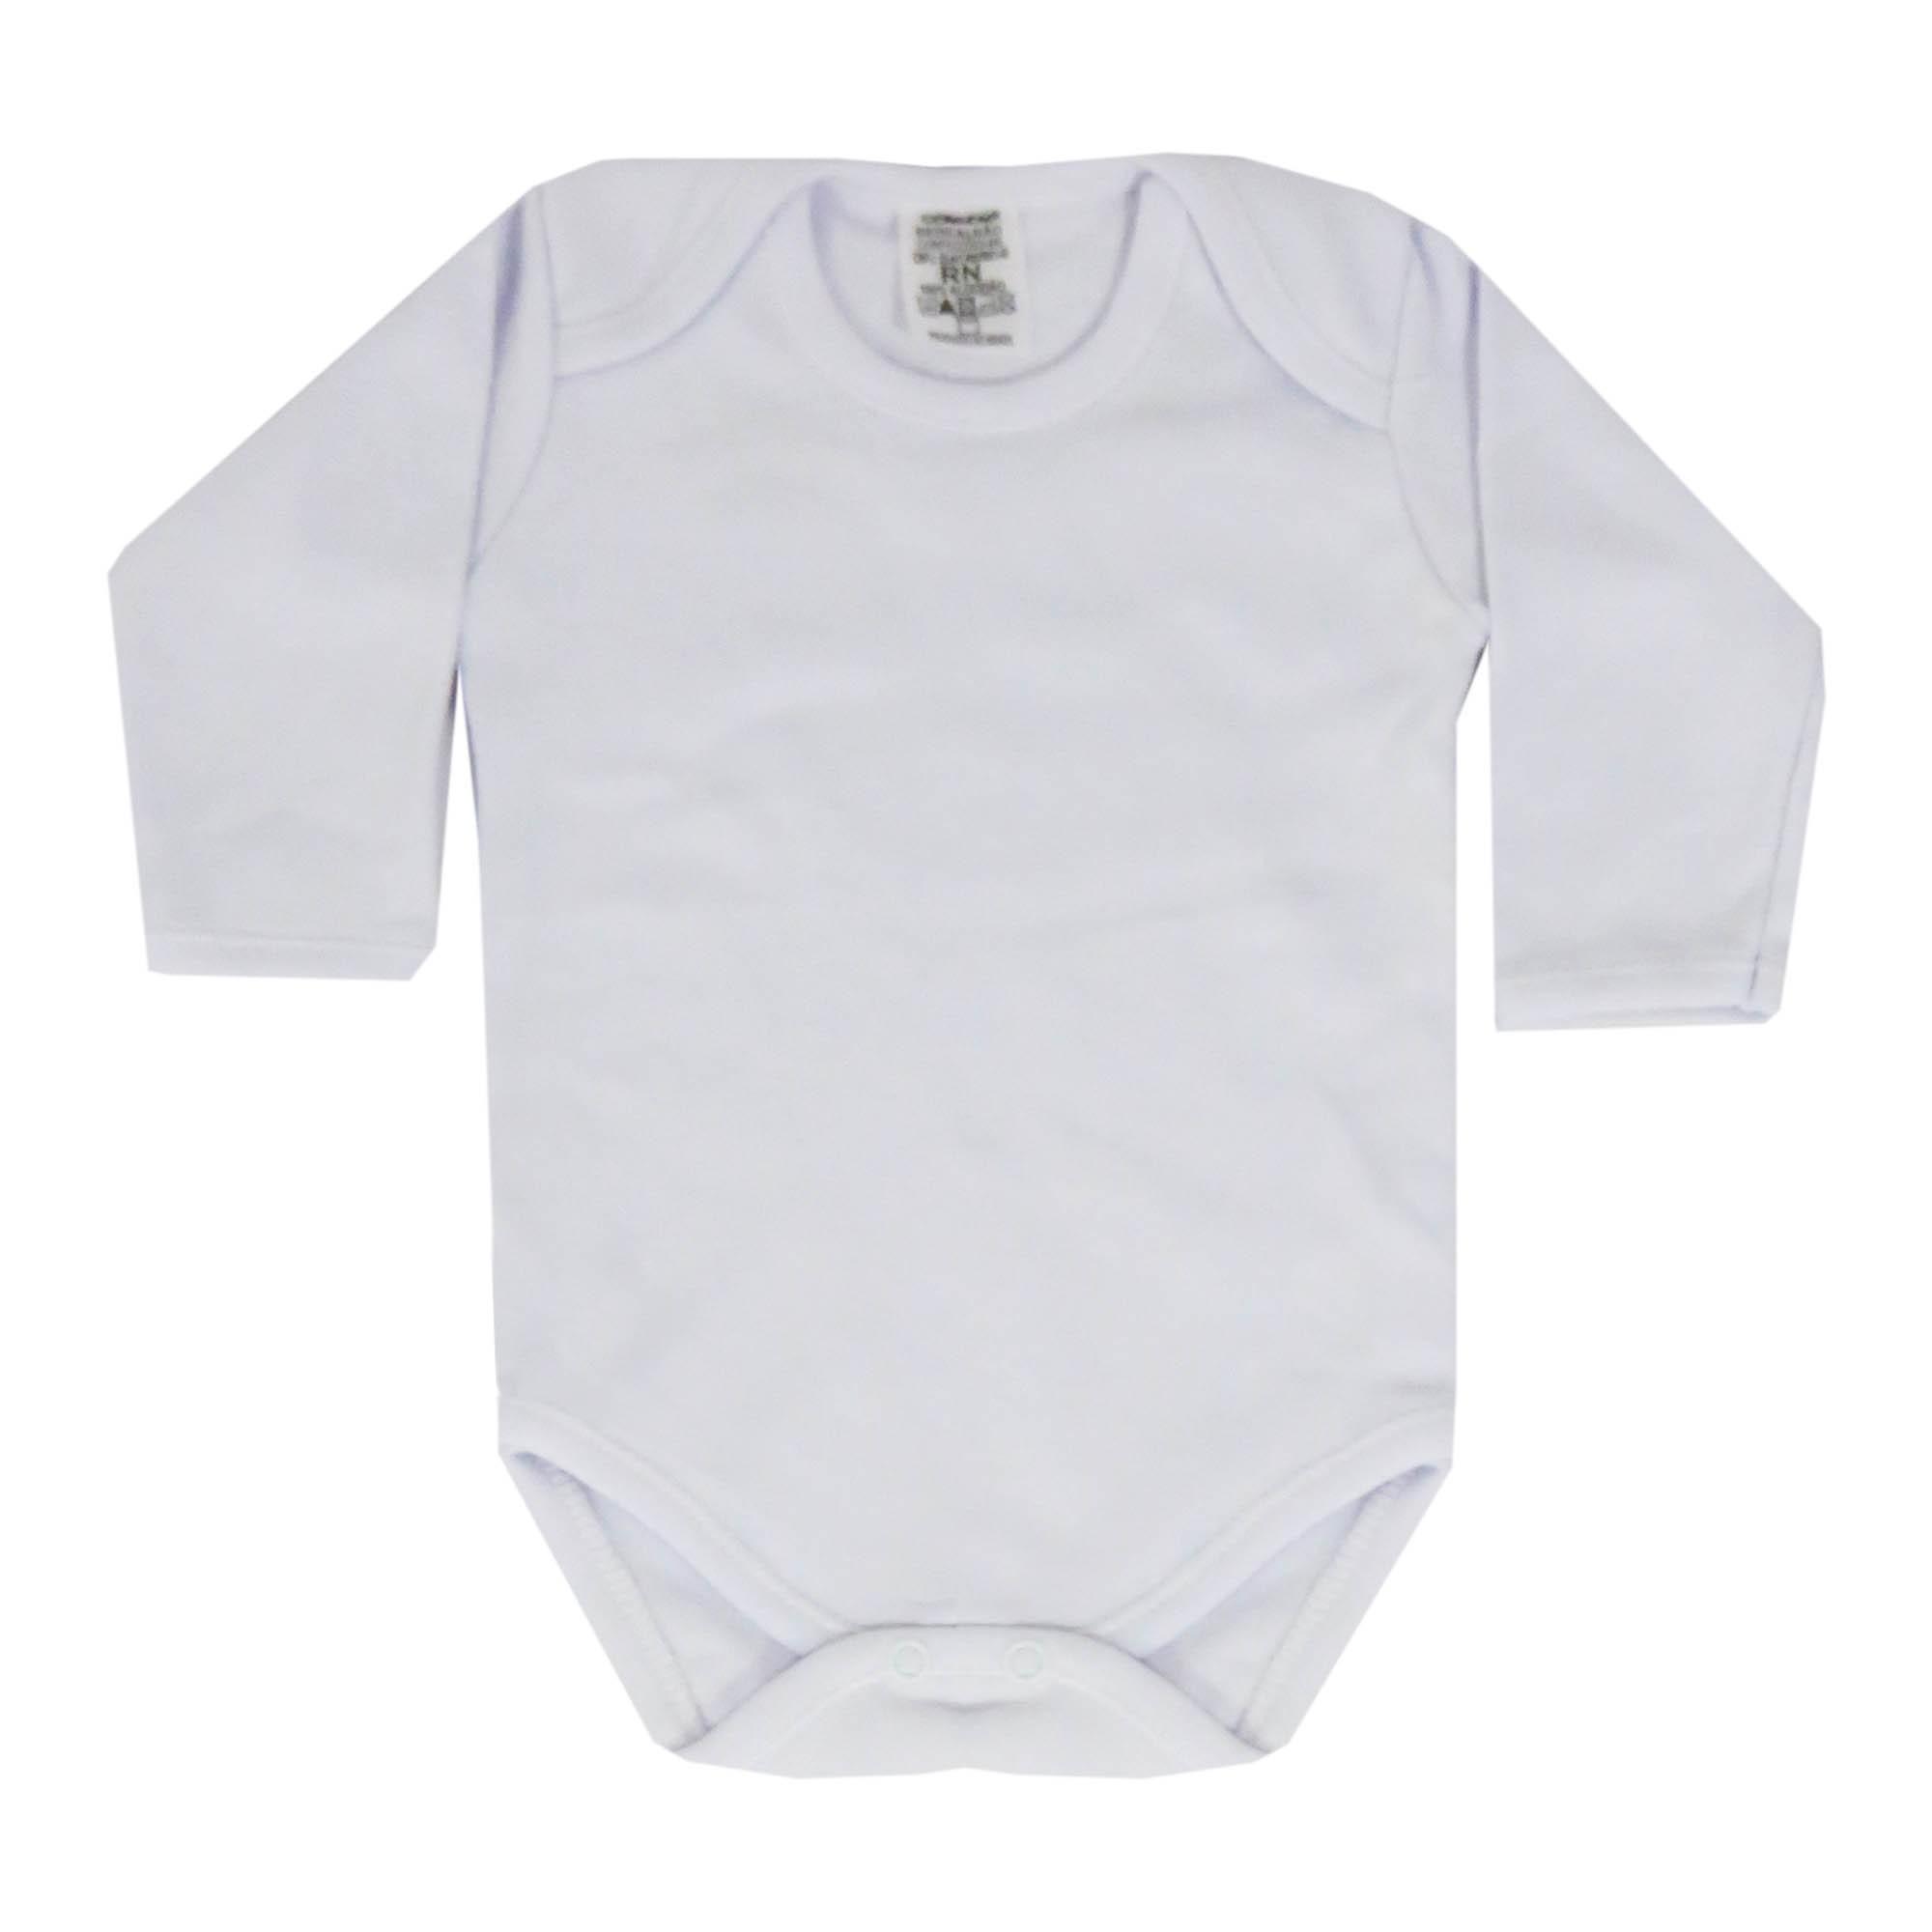 Body Manga Longa Bebê Brincalhão Branco Liso - RN